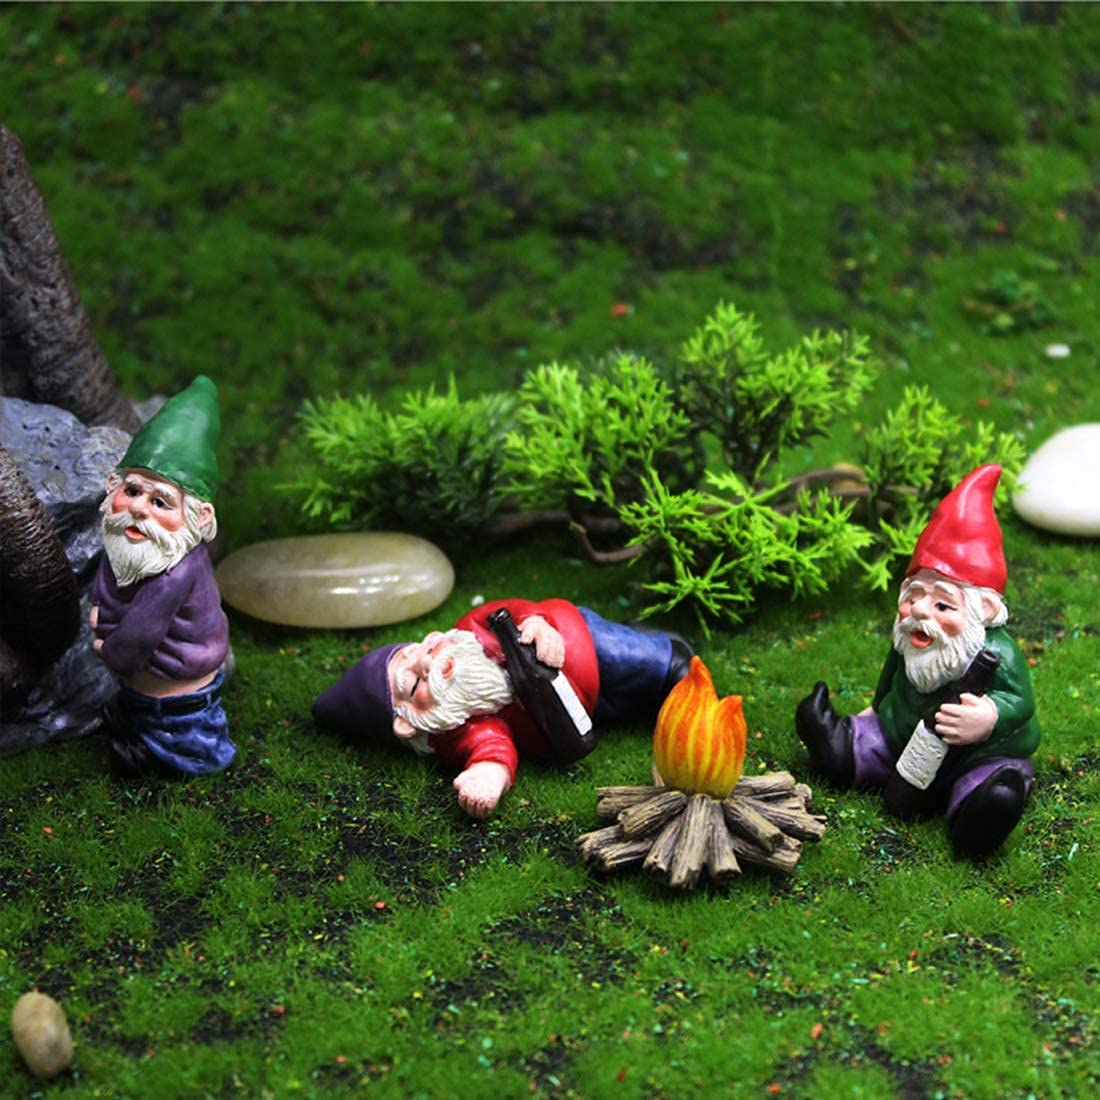 4PCS Garden Gnome Happy Beer Guzzling Gnome Happy Garden Statue Miniature Fairy Garden Figurines Set for Outdoor Decor